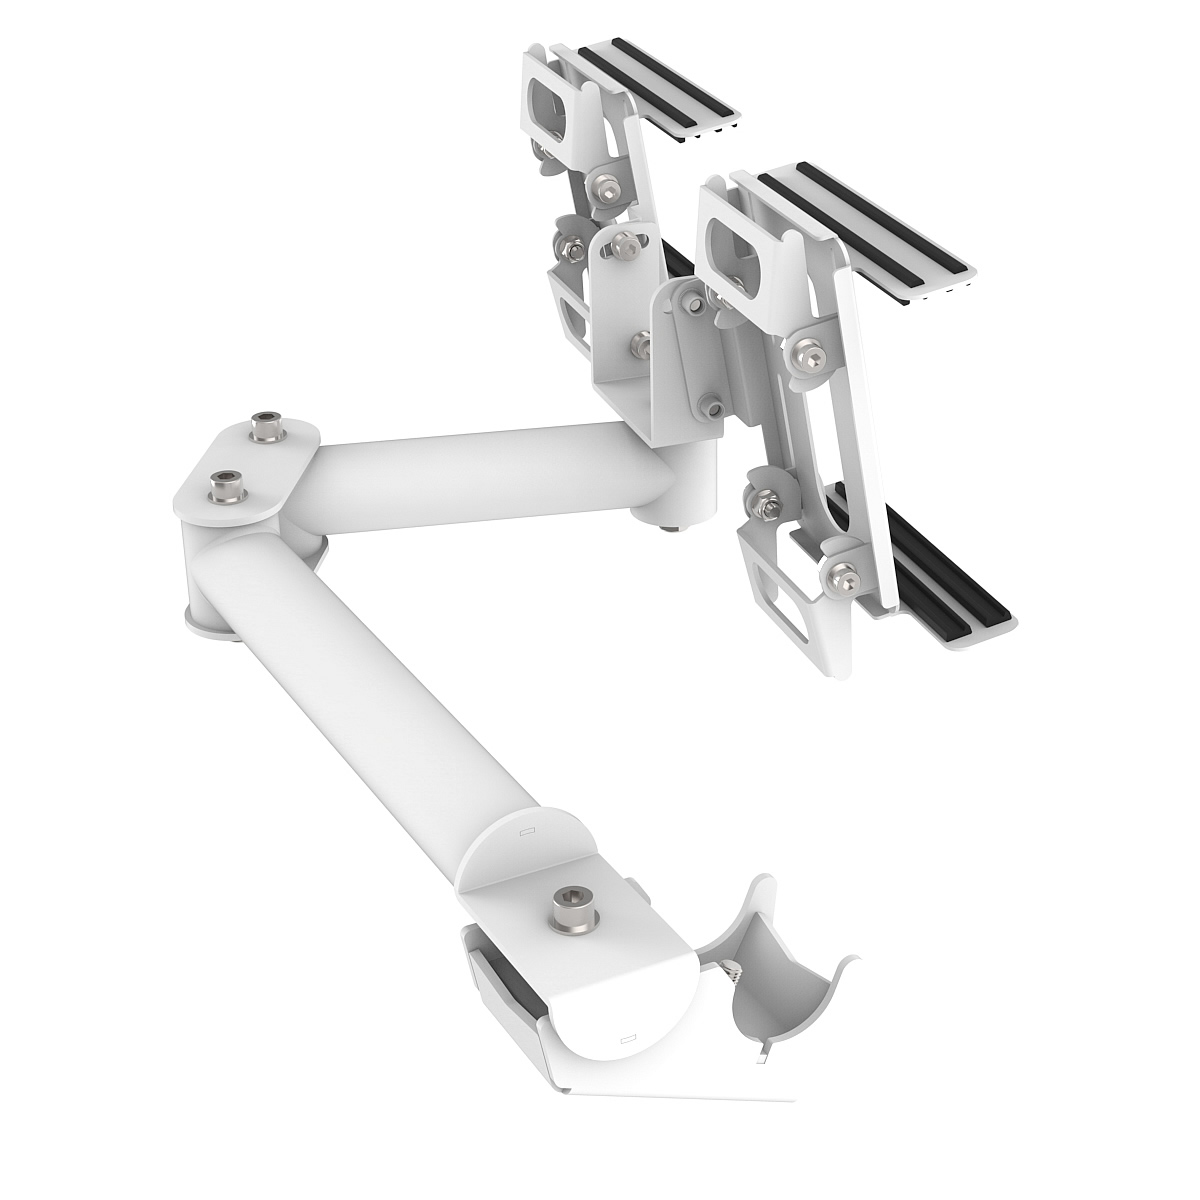 B1 / P1 / C1 Tablet / Buttonbox Upgrade kit White